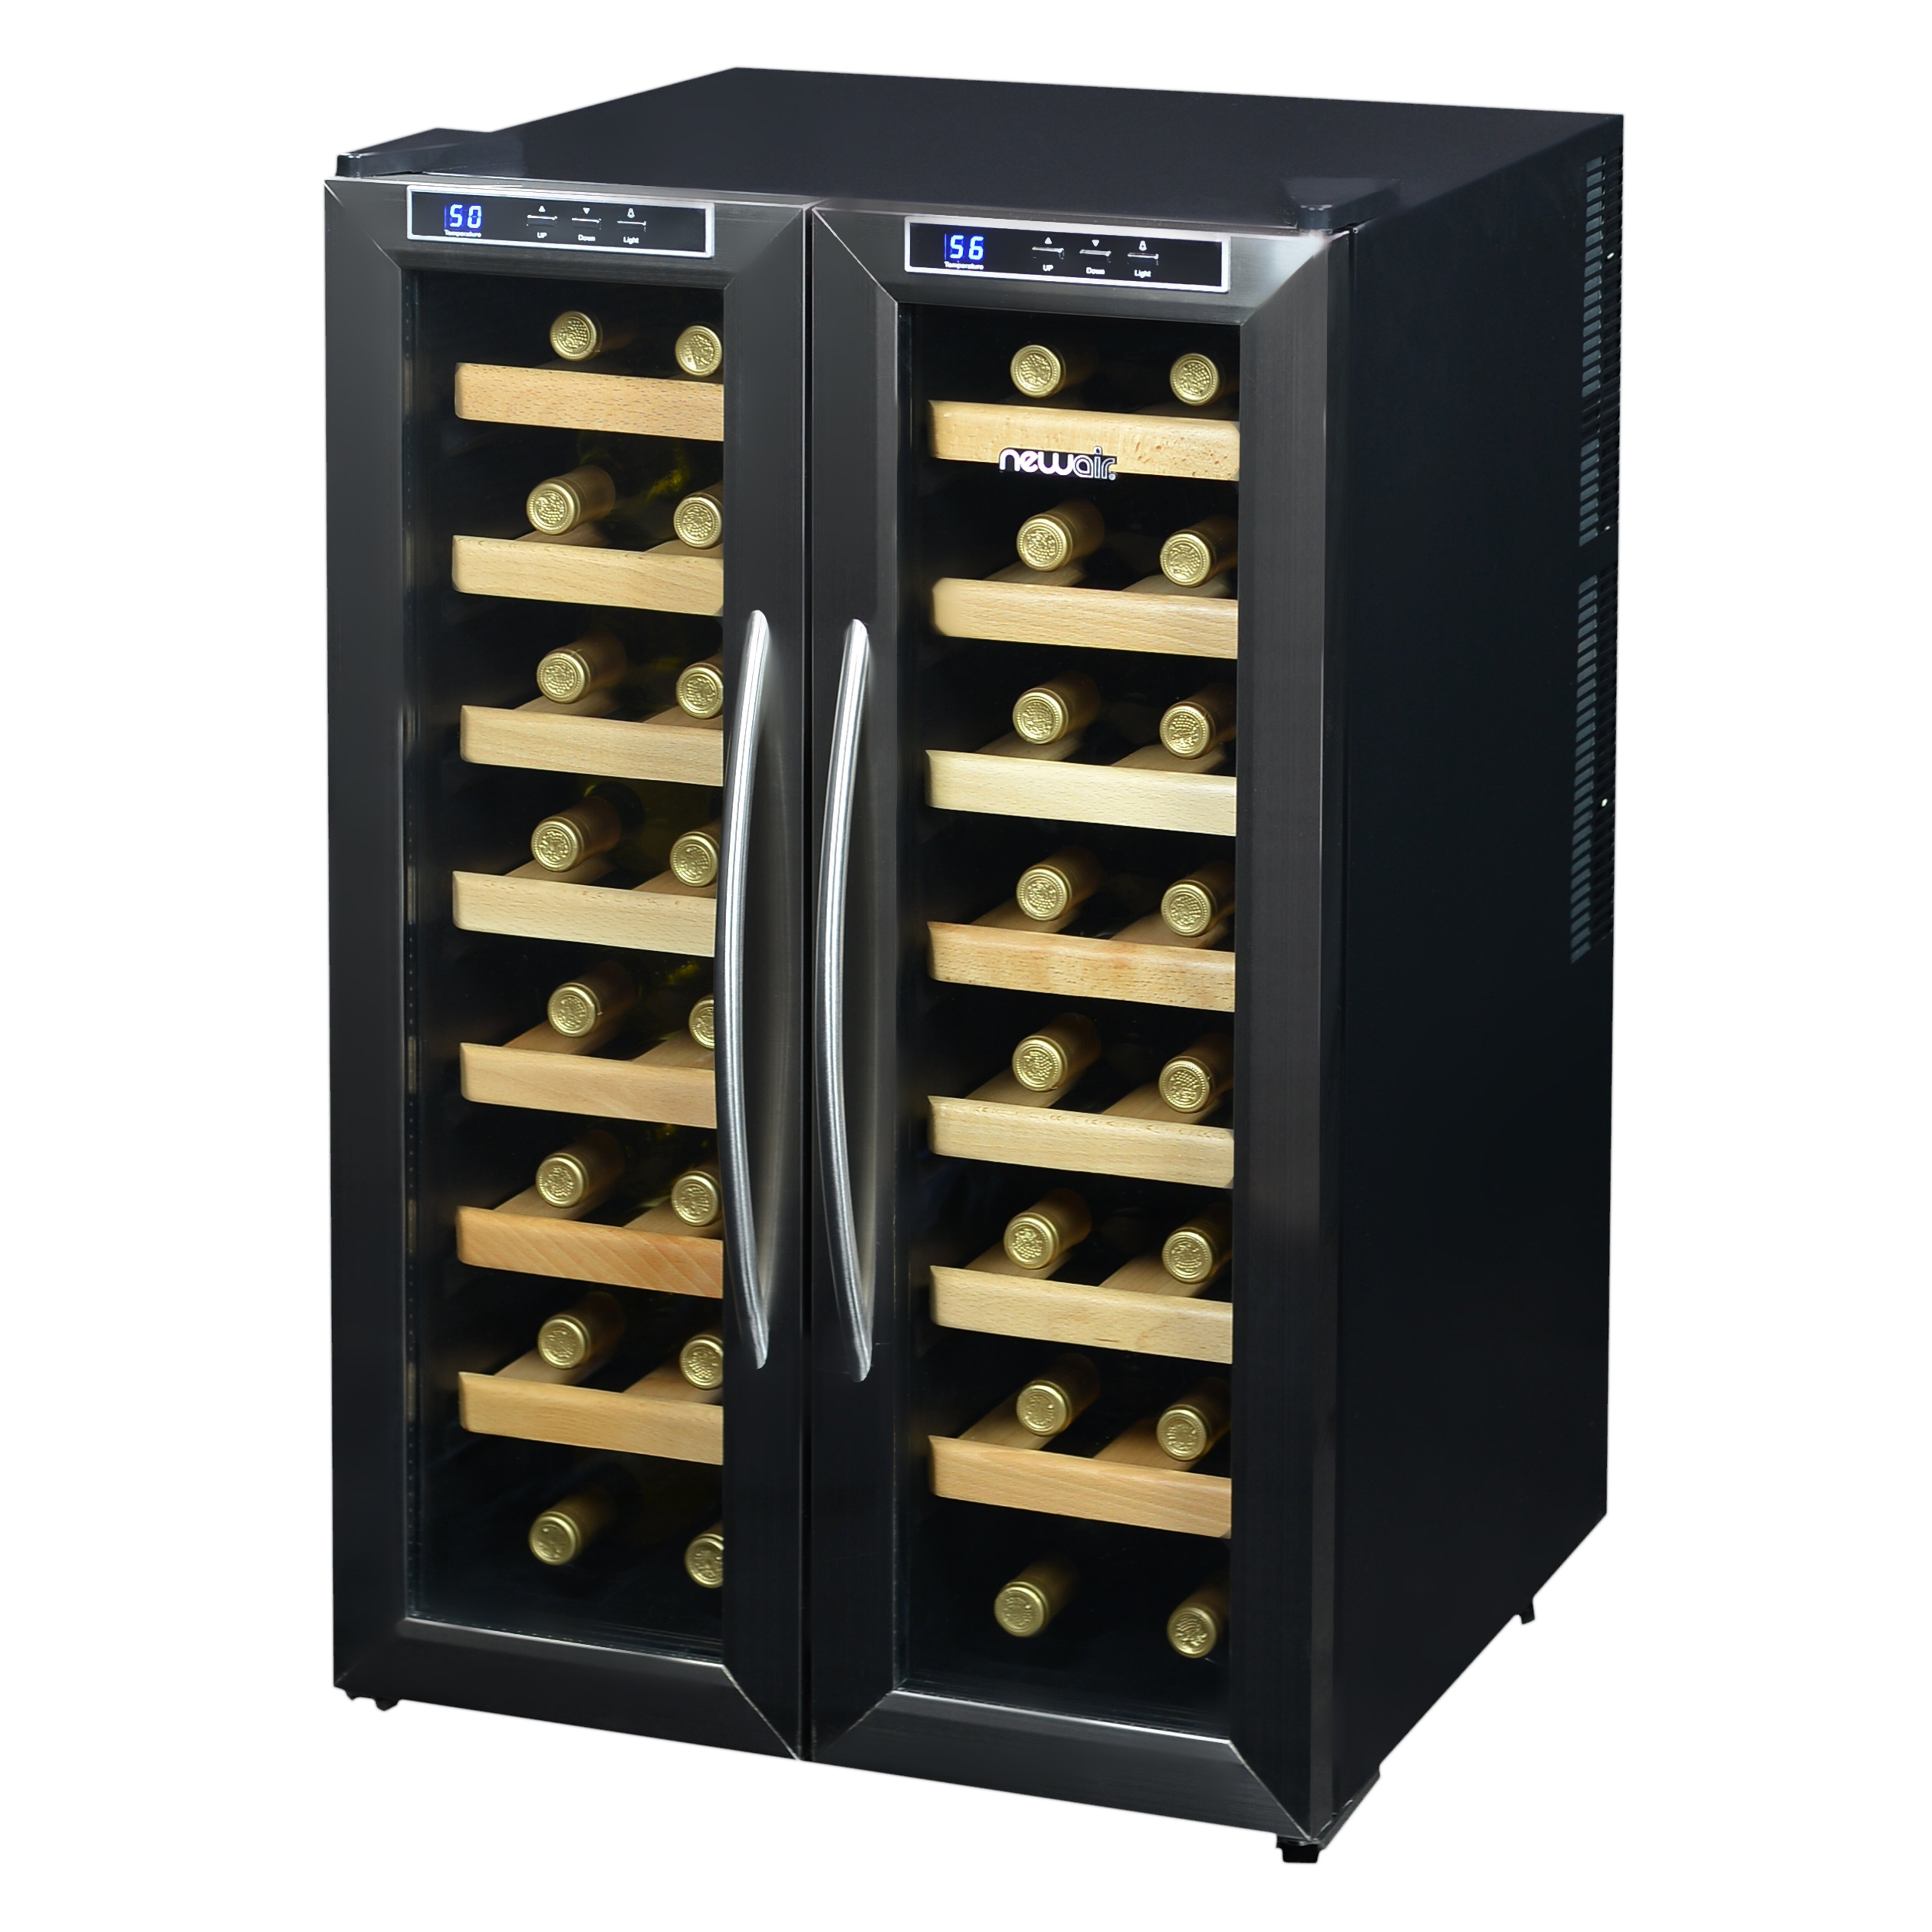 Newair 32 Bottle Dual Zone Freestanding Wine Refrigerator